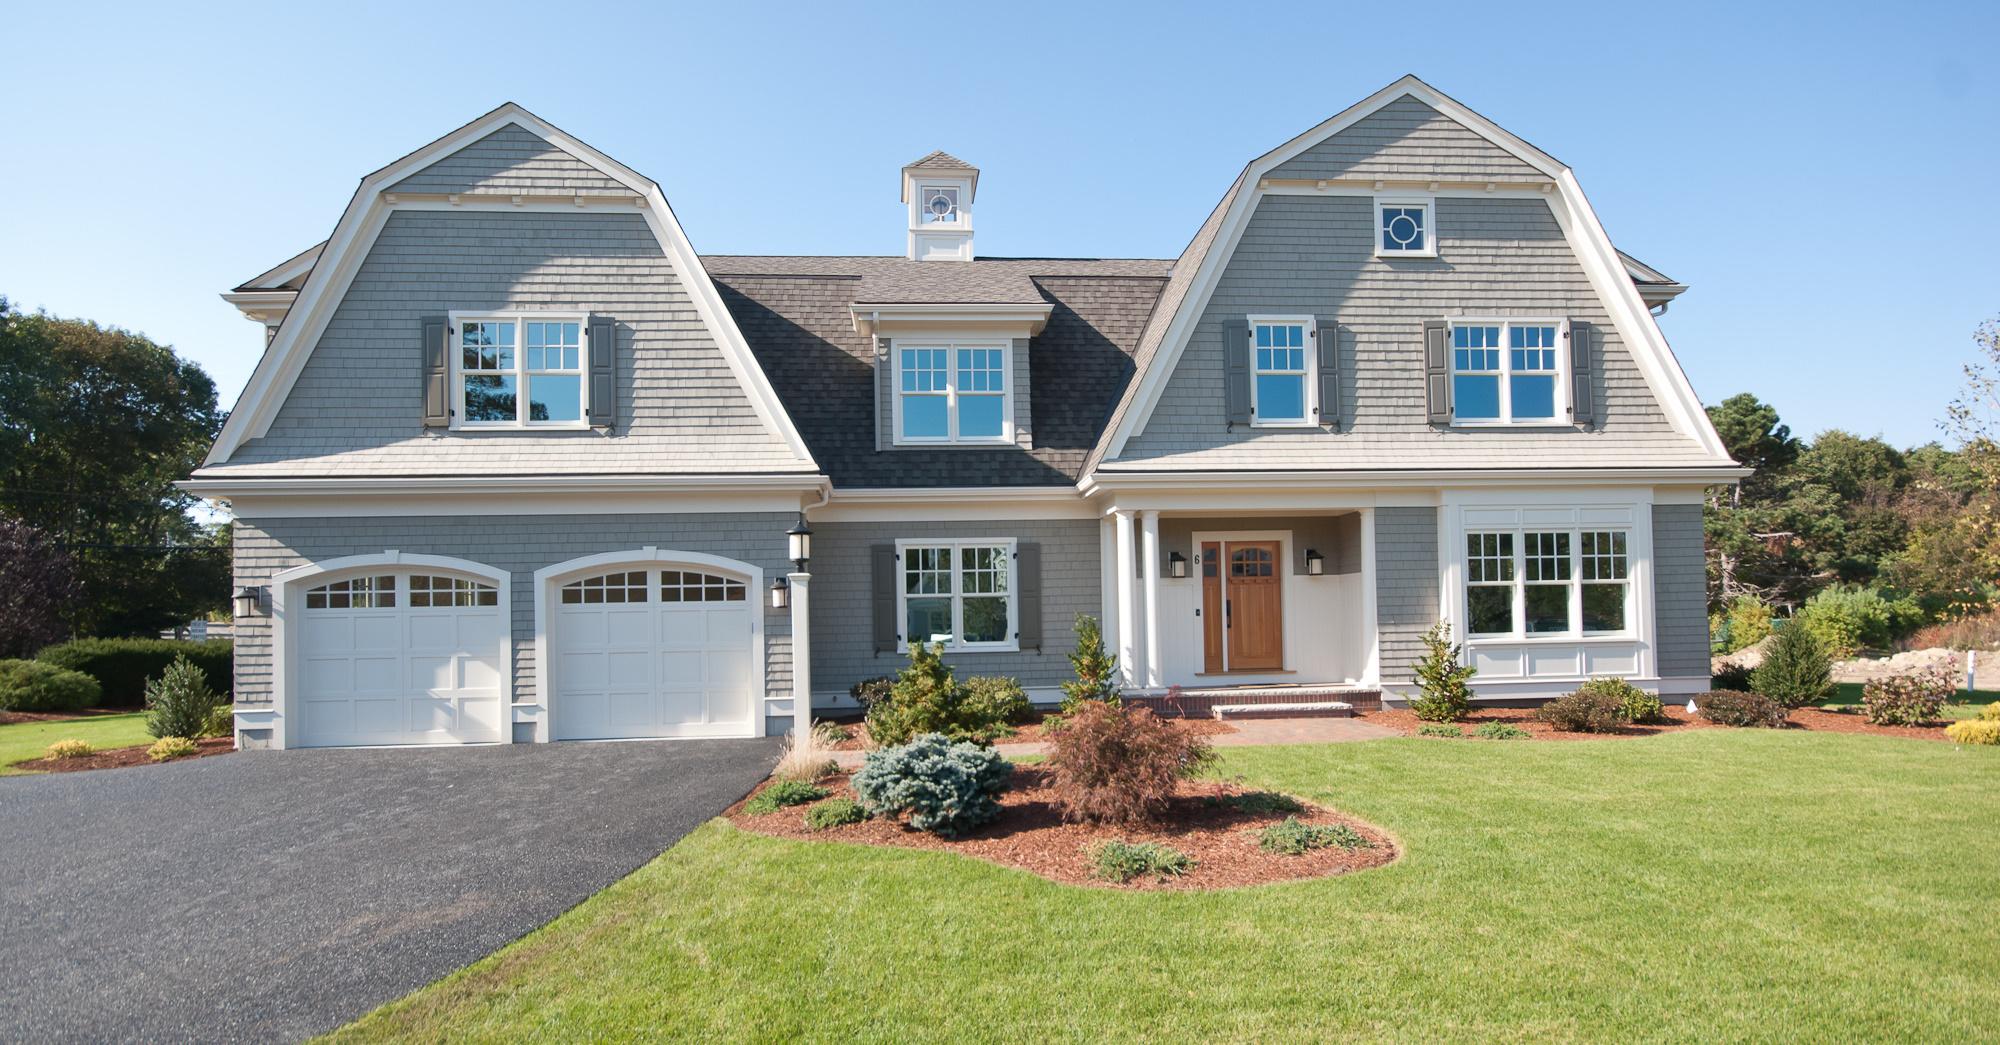 American Home Design Inspiration